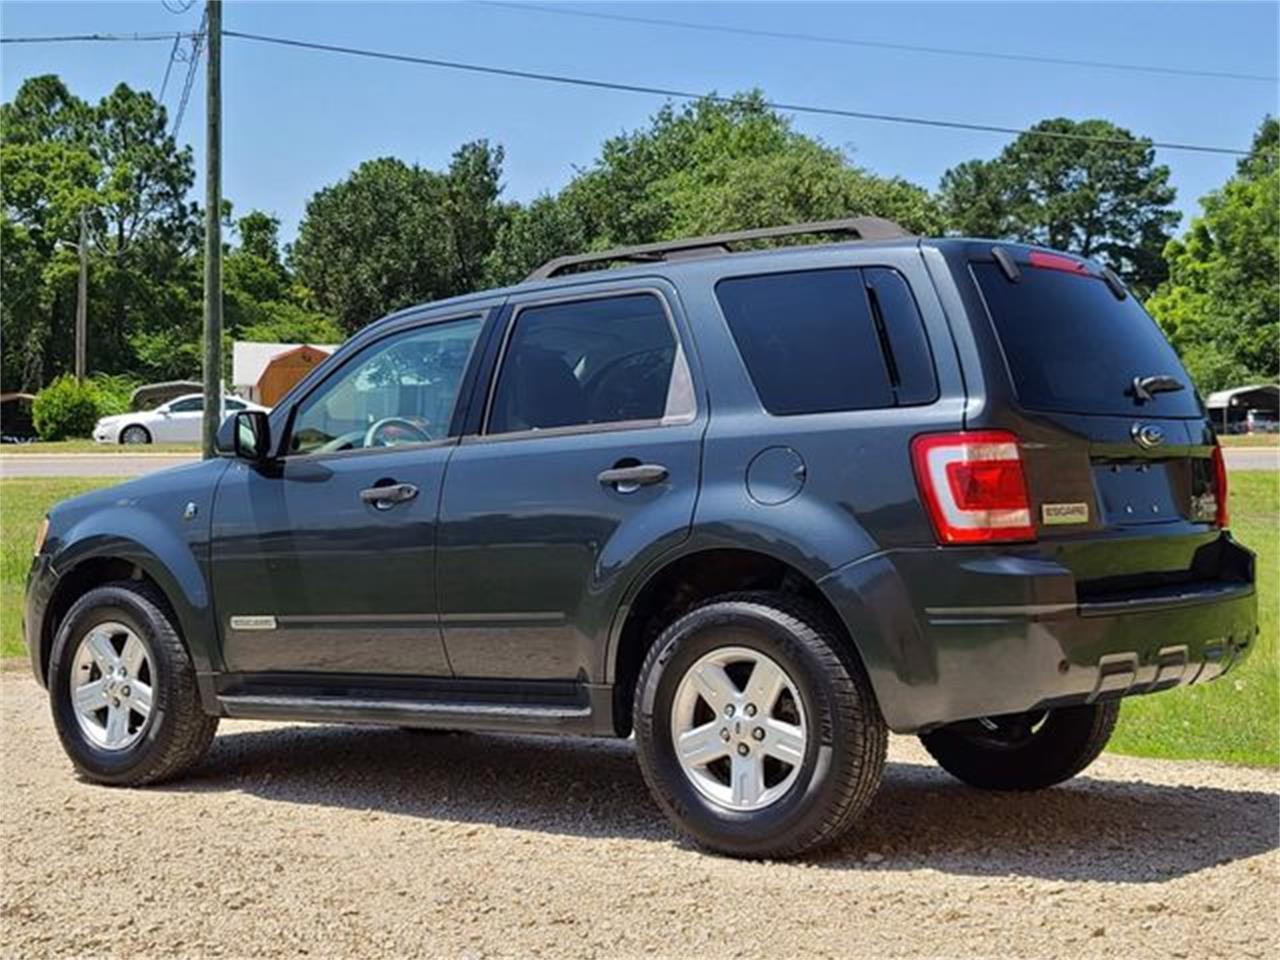 2008 Ford Escape (CC-1362138) for sale in Hope Mills, North Carolina